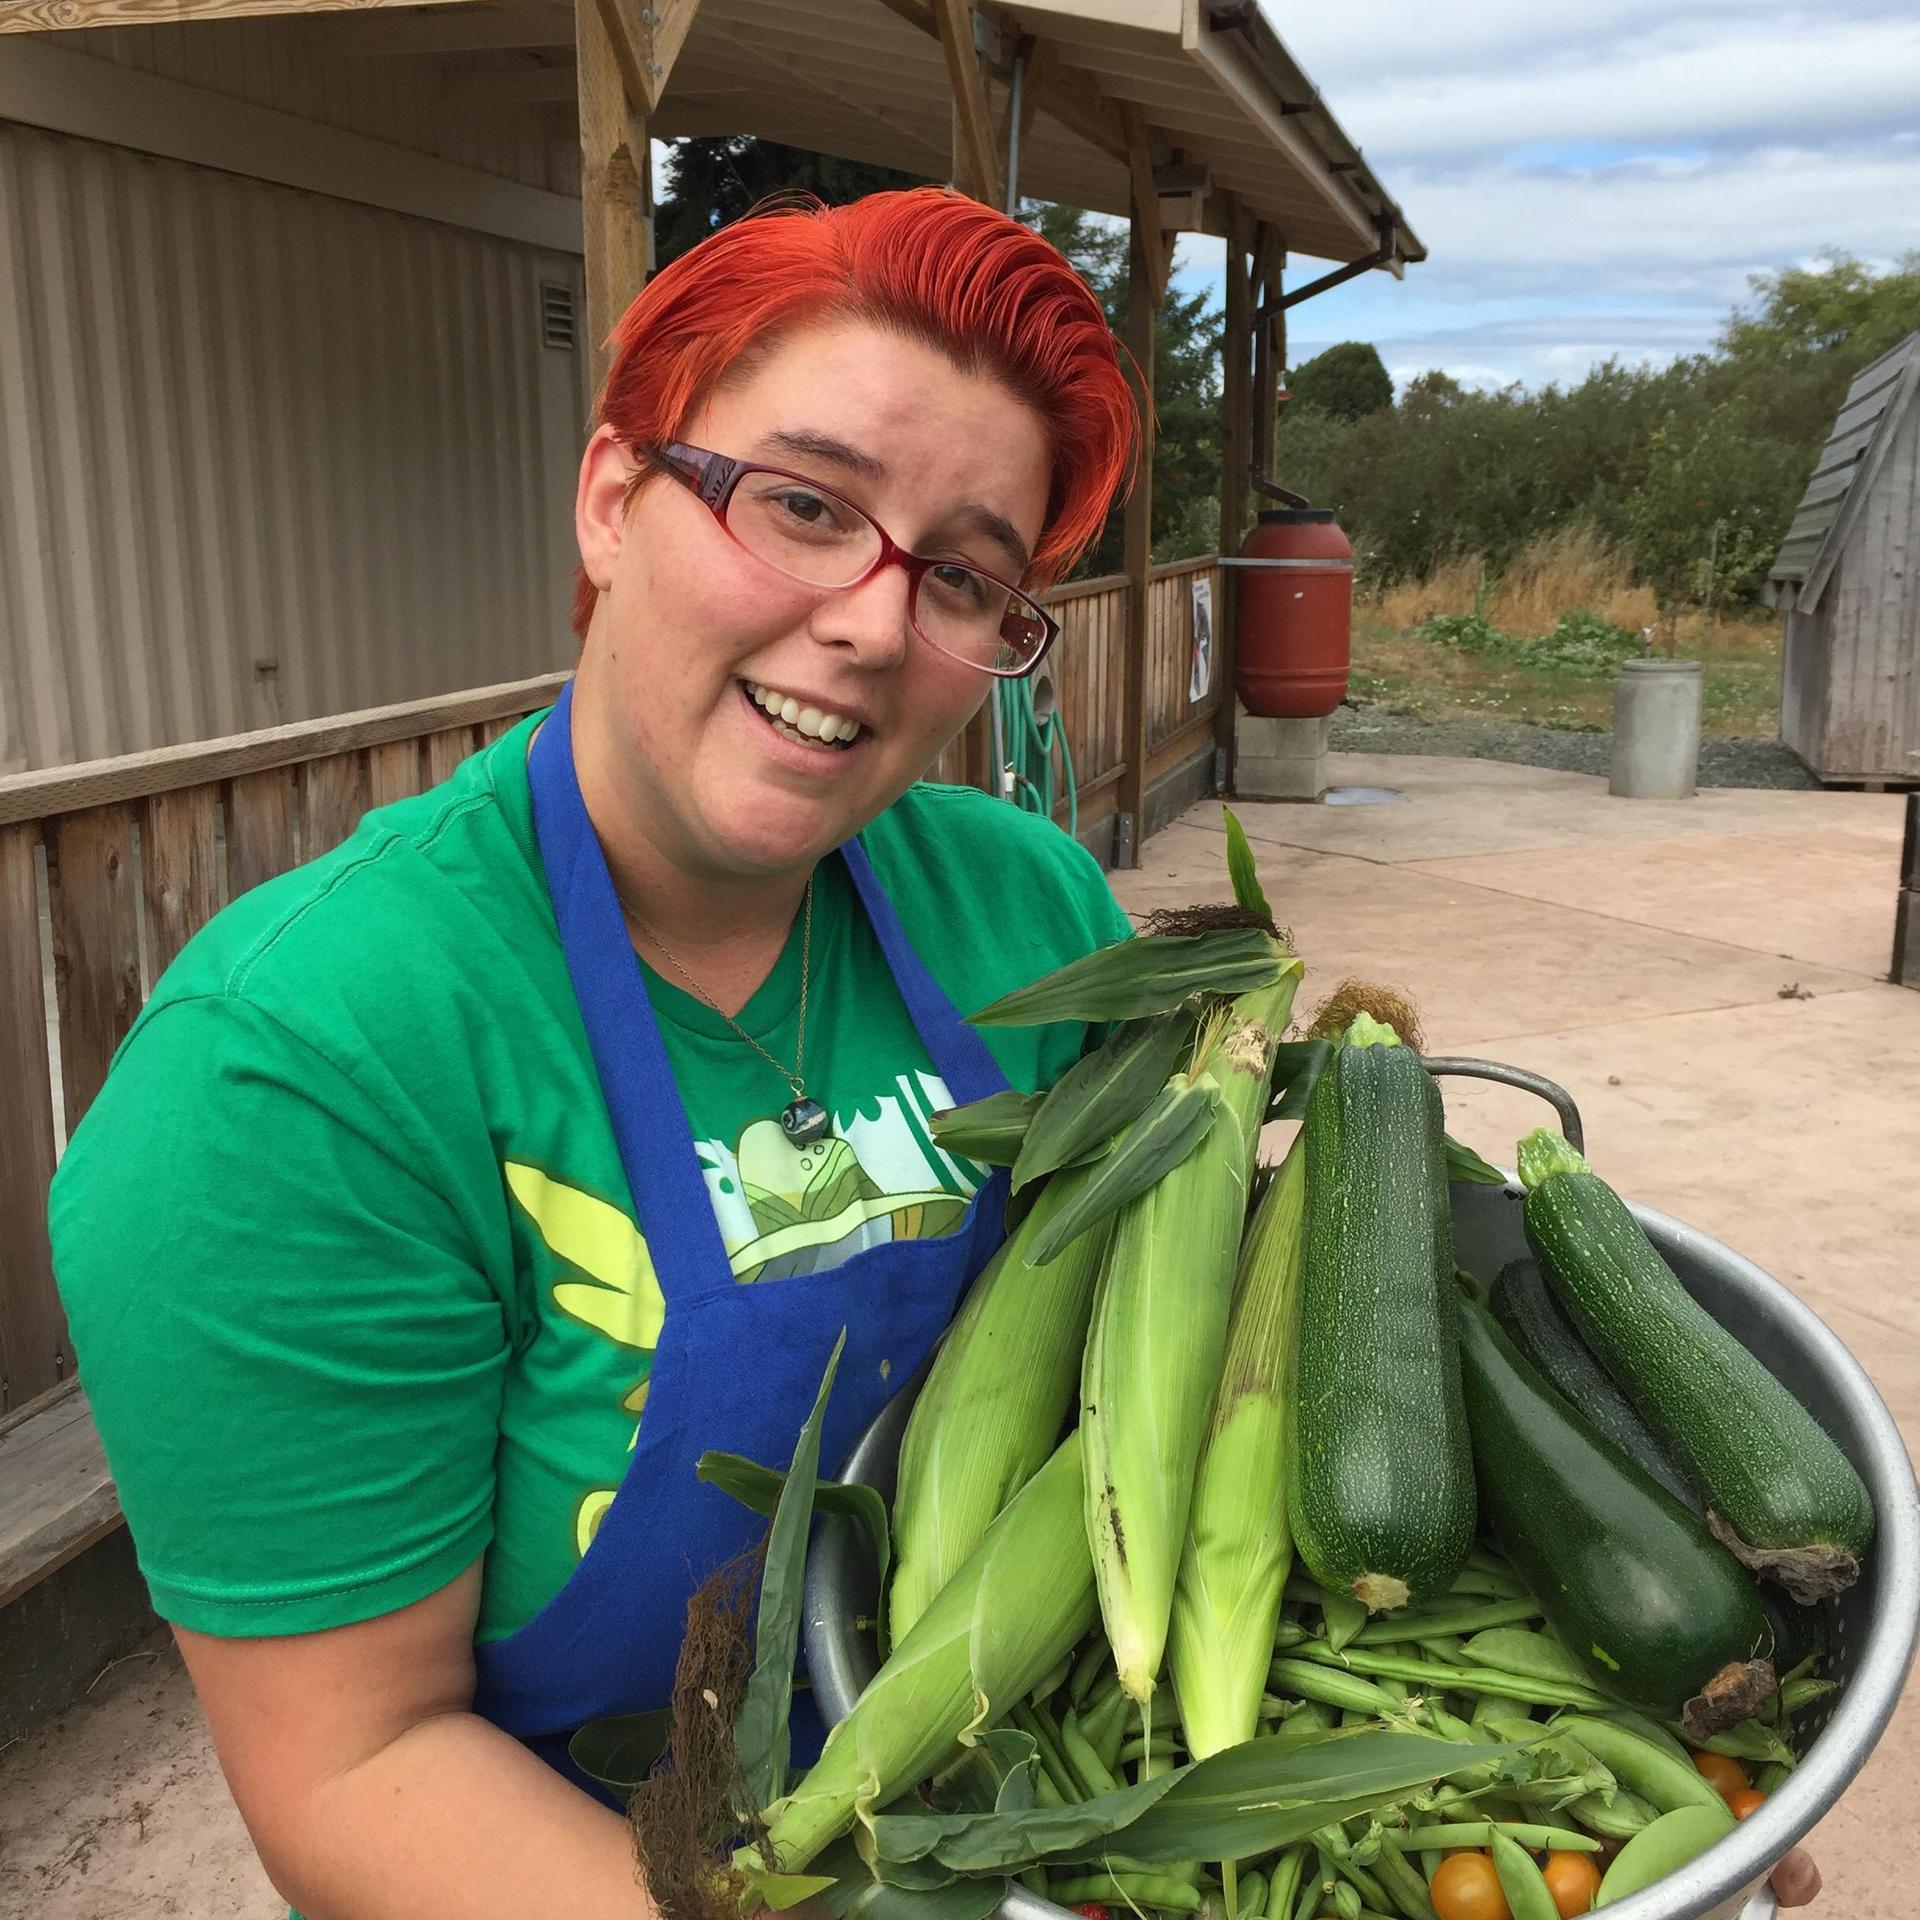 Teacher with veggies from garden